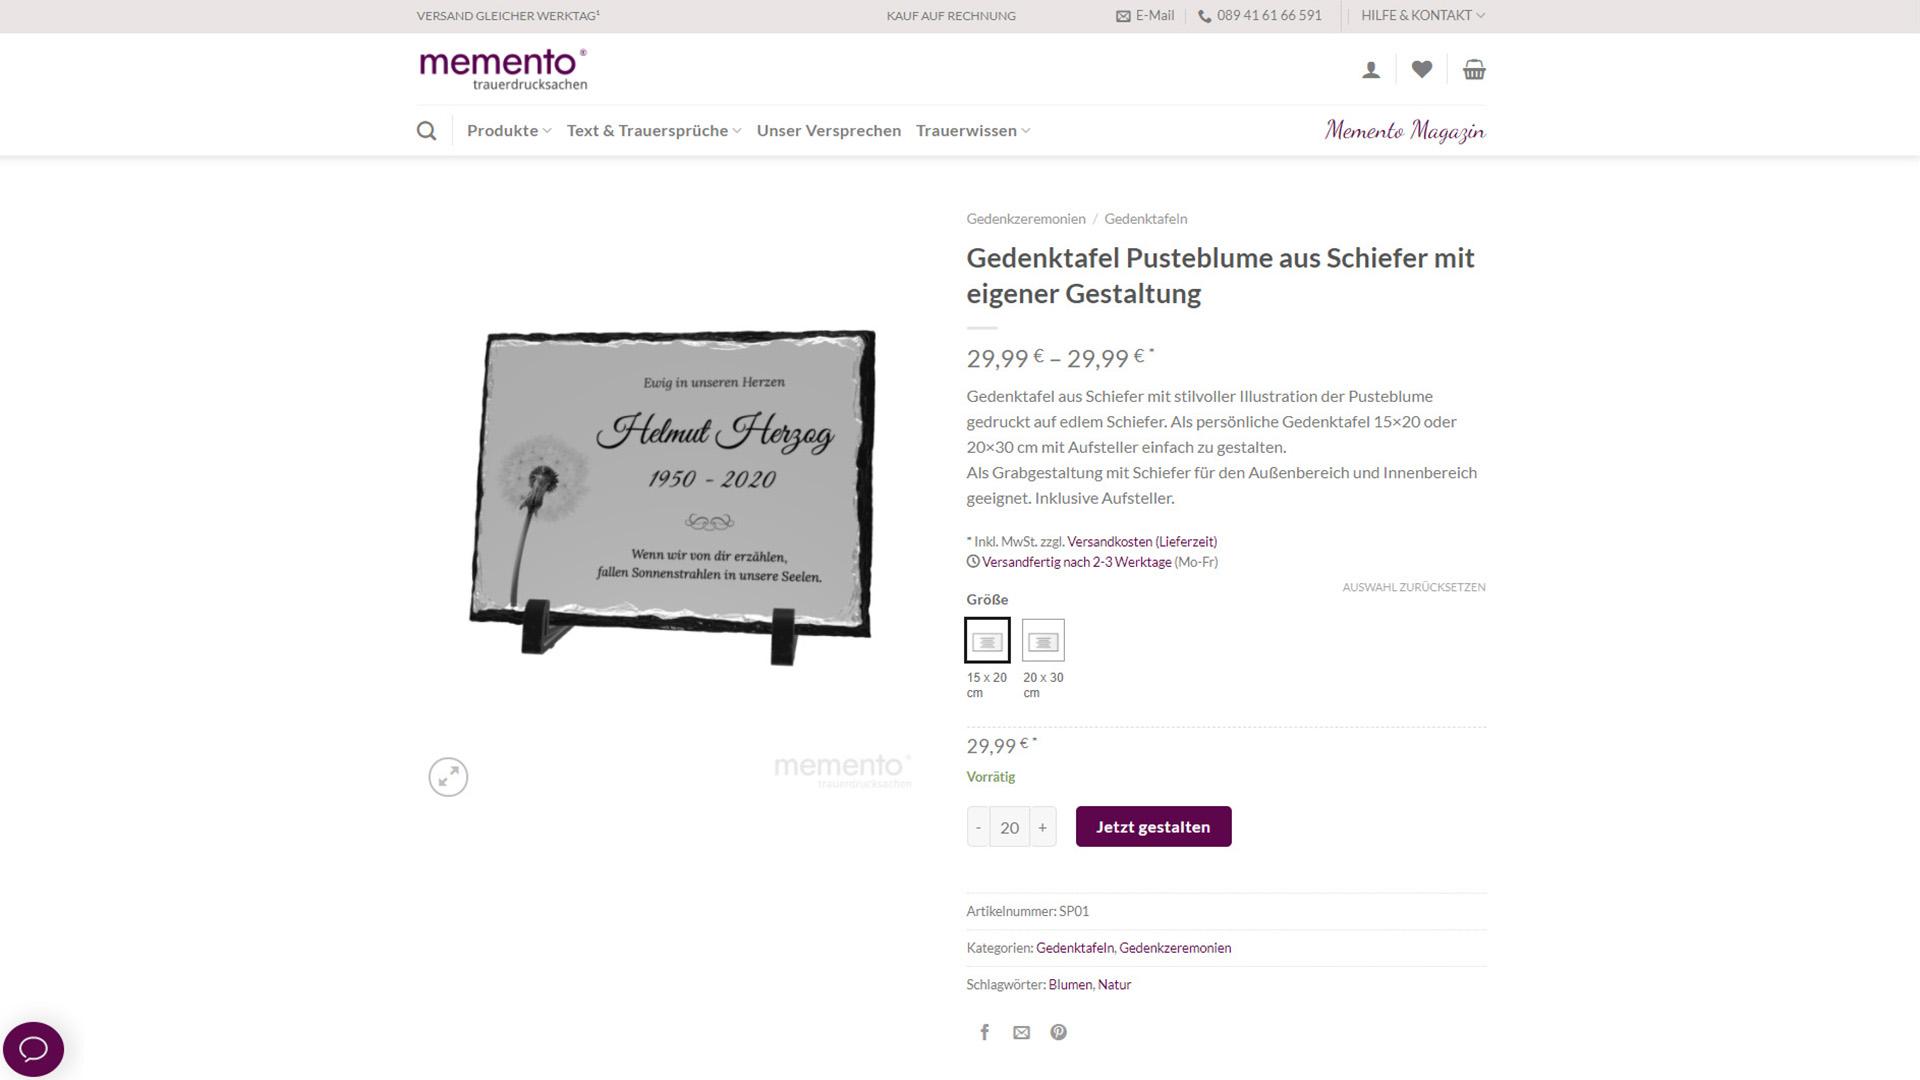 Memento Webshop Konfigurator Schiefertafel Webseite